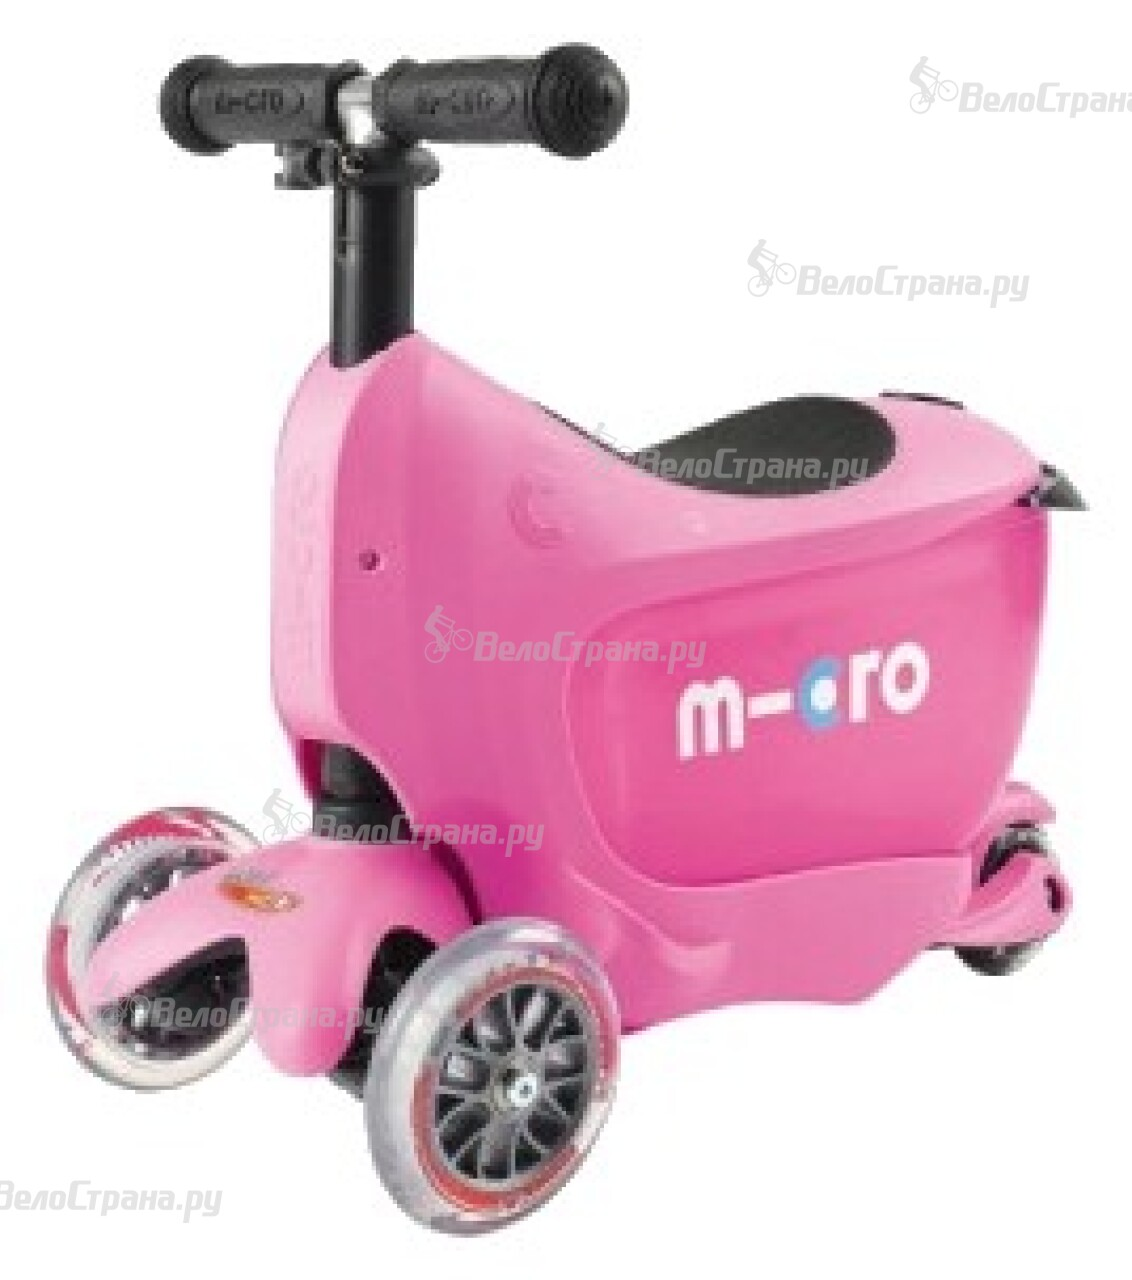 Самокат Micro MINI2GO